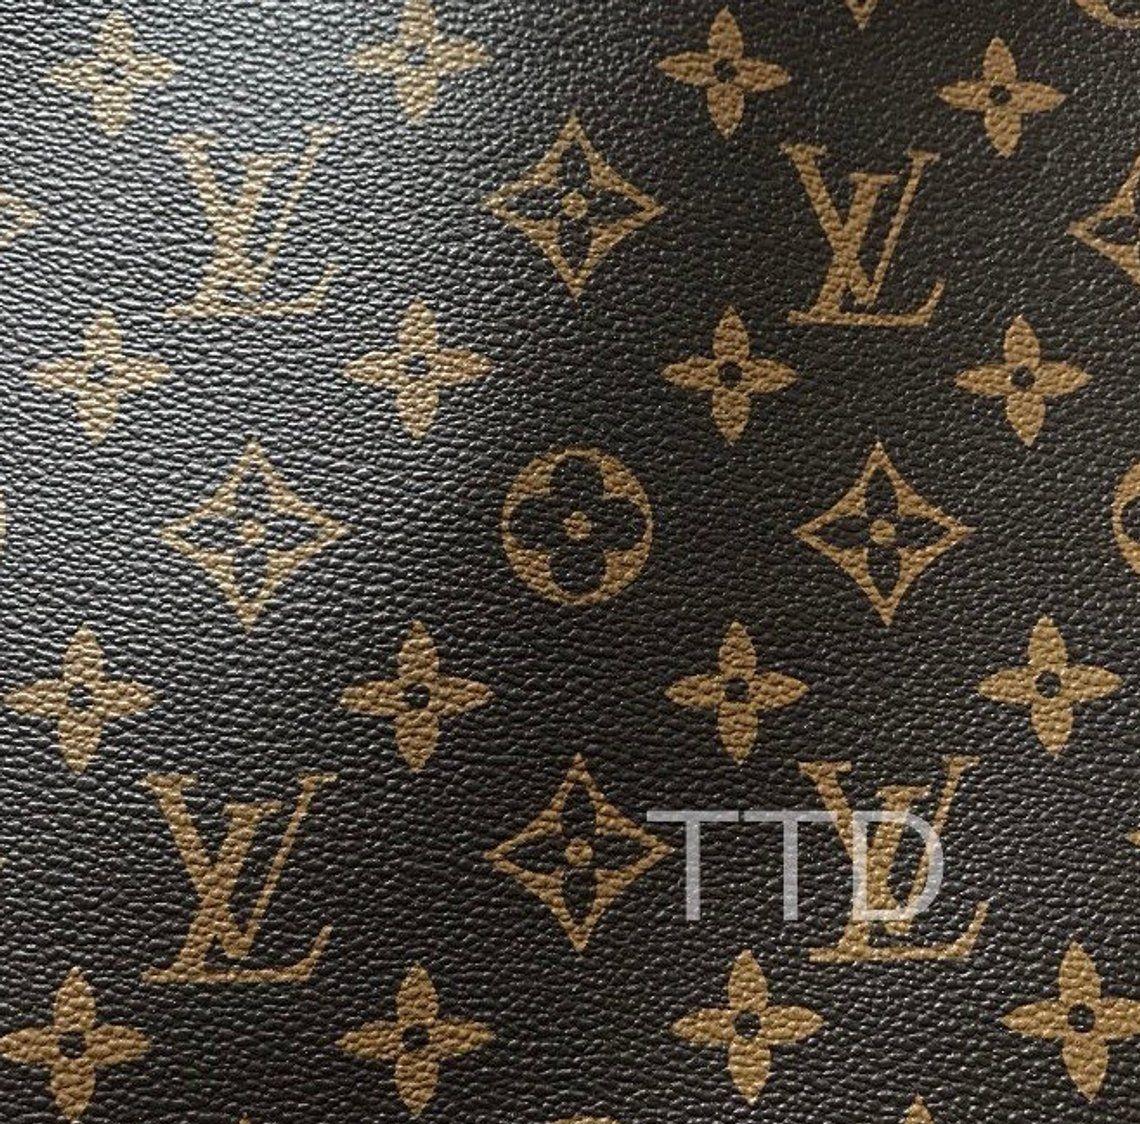 1bc6709d6a81 Louis Vuitton LV Leather Vinyl Louis Vuitton LV Fabric Material By ...